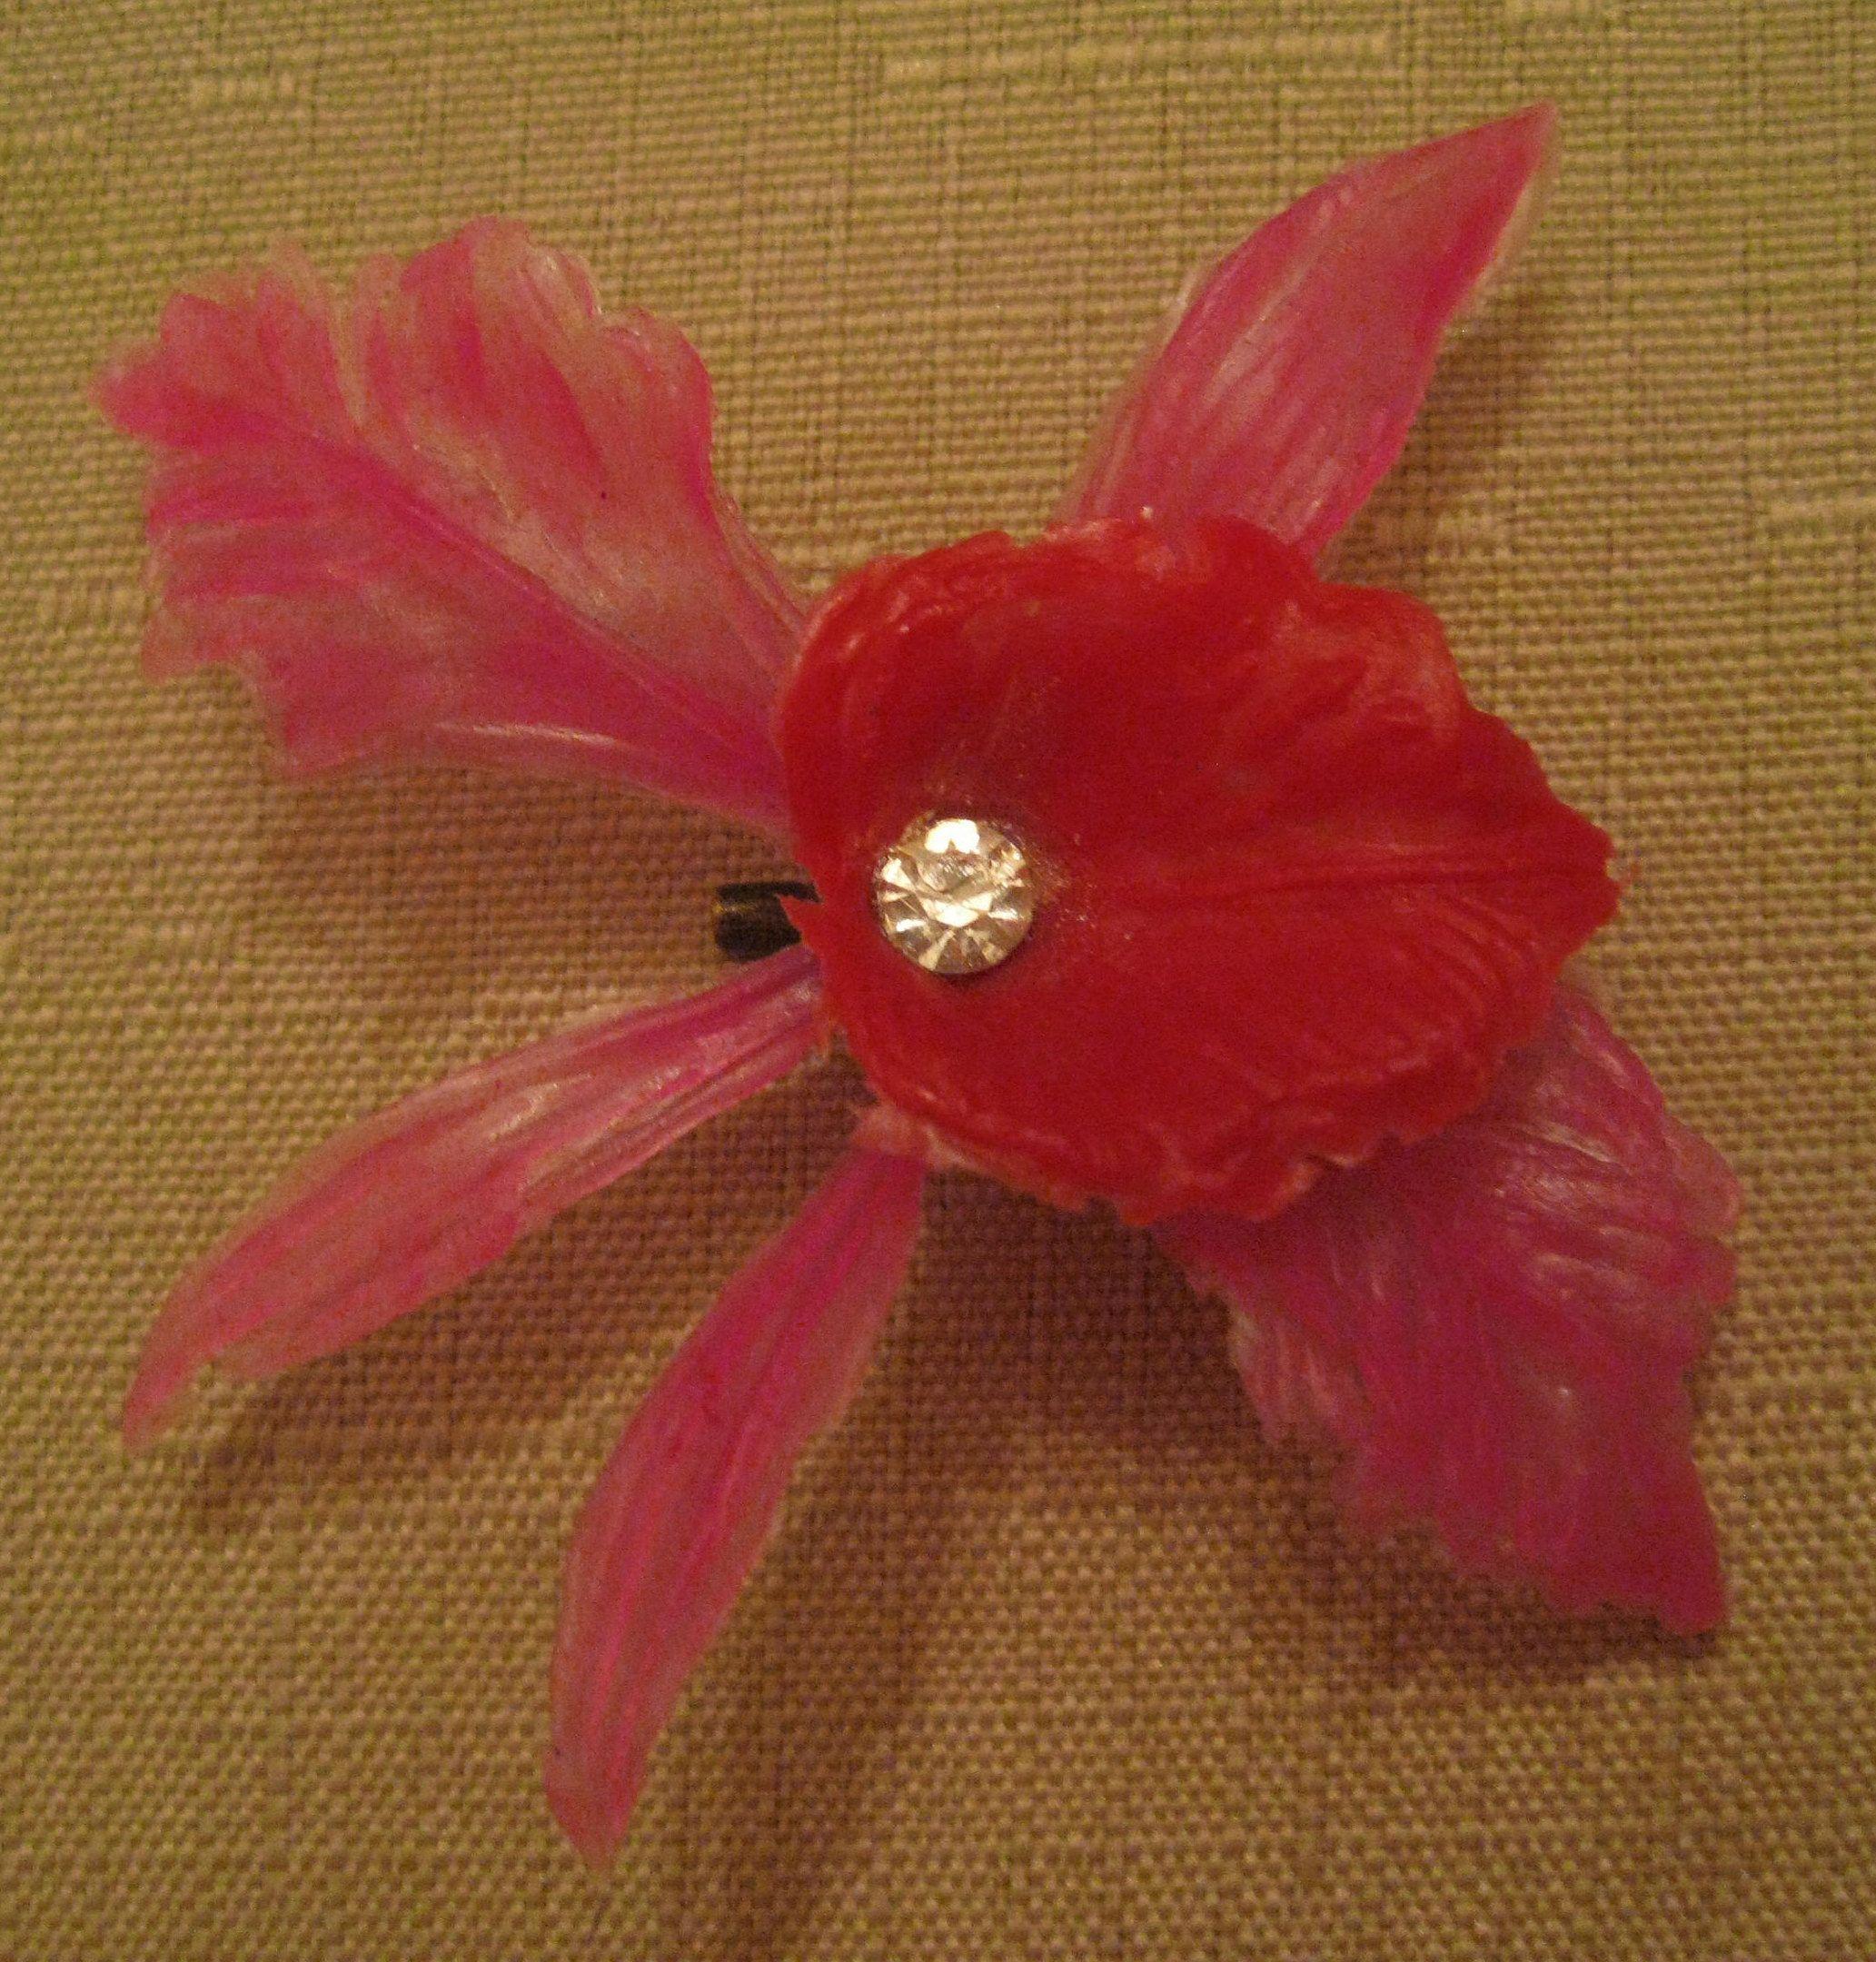 Rhinestone plastic orchid flower brooch vintage us accessories